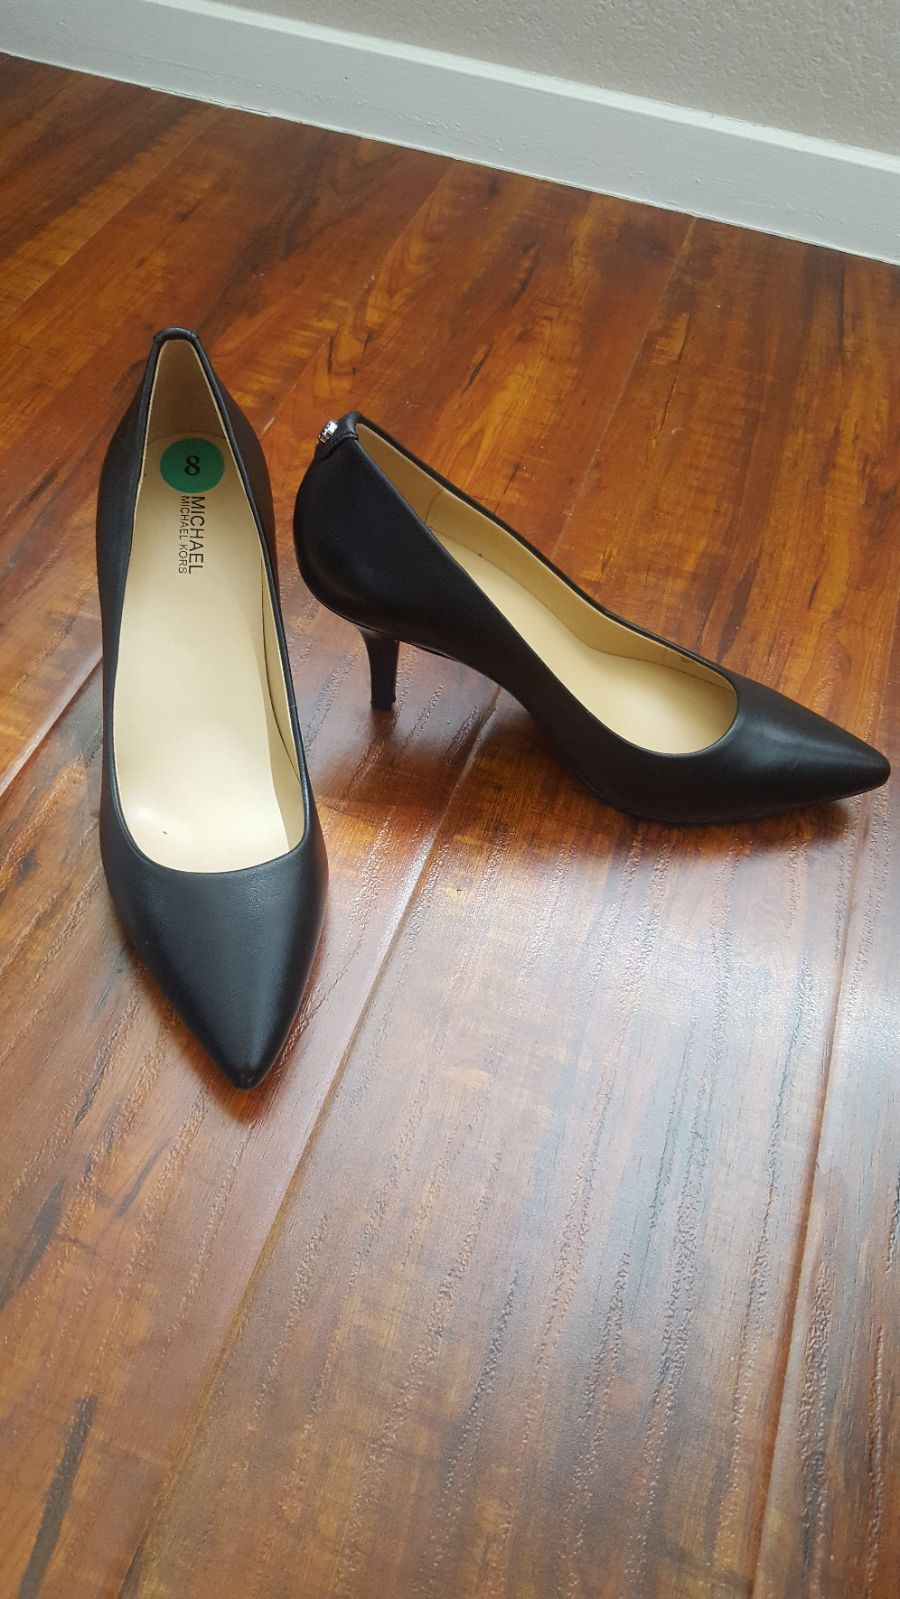 Michael Kors leather pumps